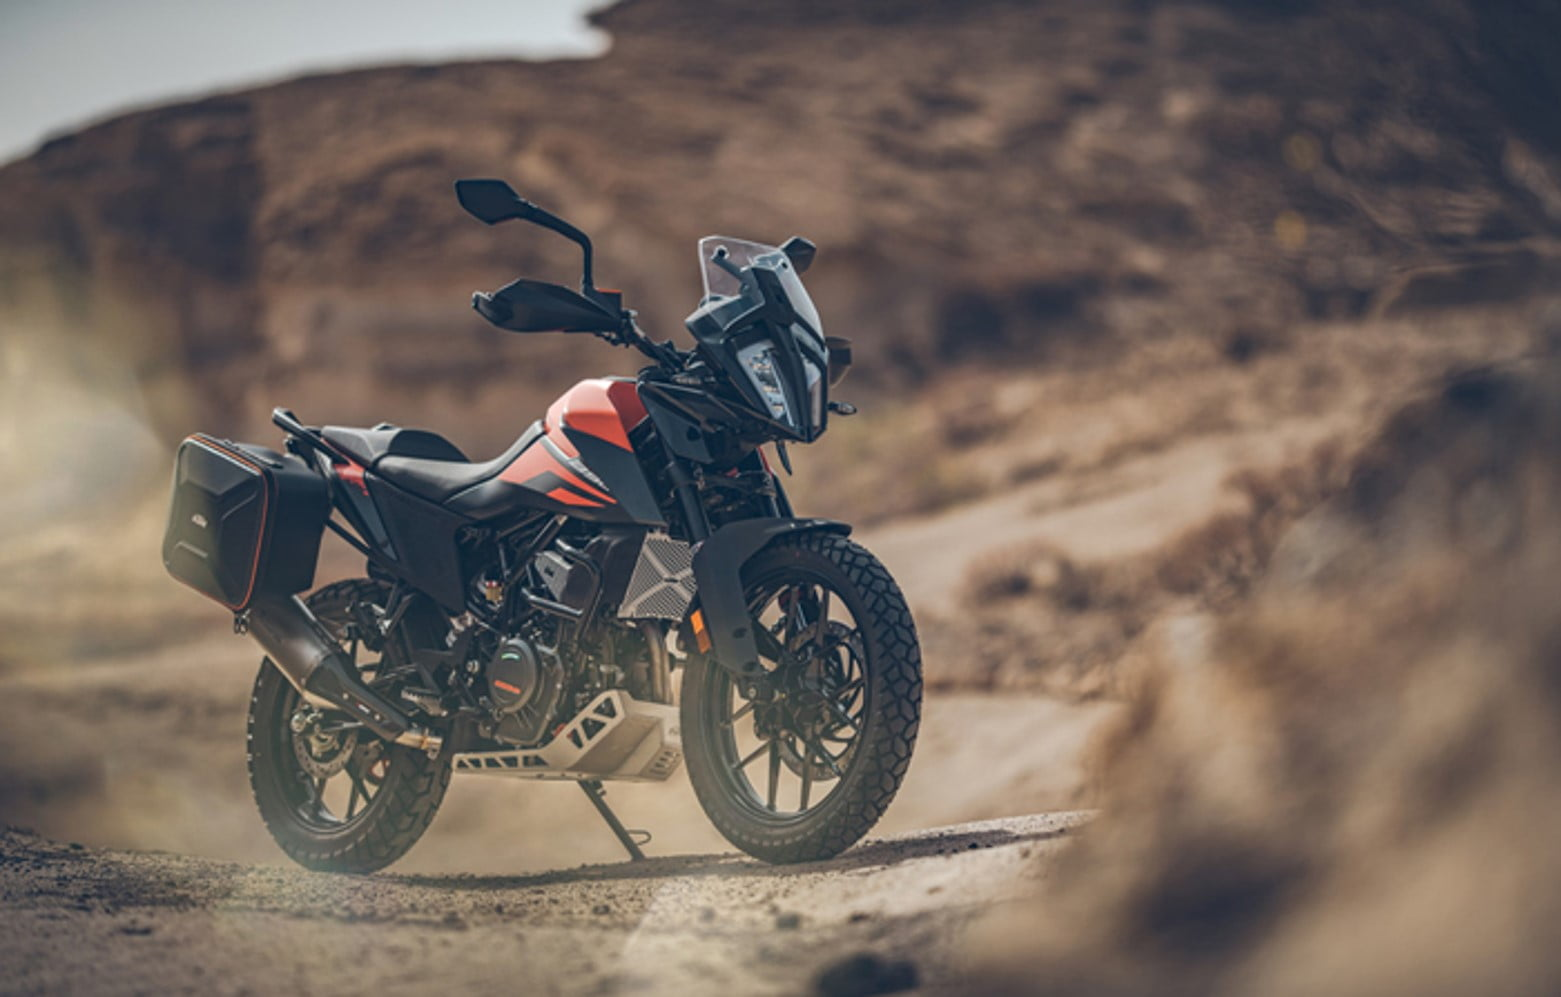 Bike Tyre Warehouse Moto Rider World Great Motorcycle Accessories for Adventure Bikes